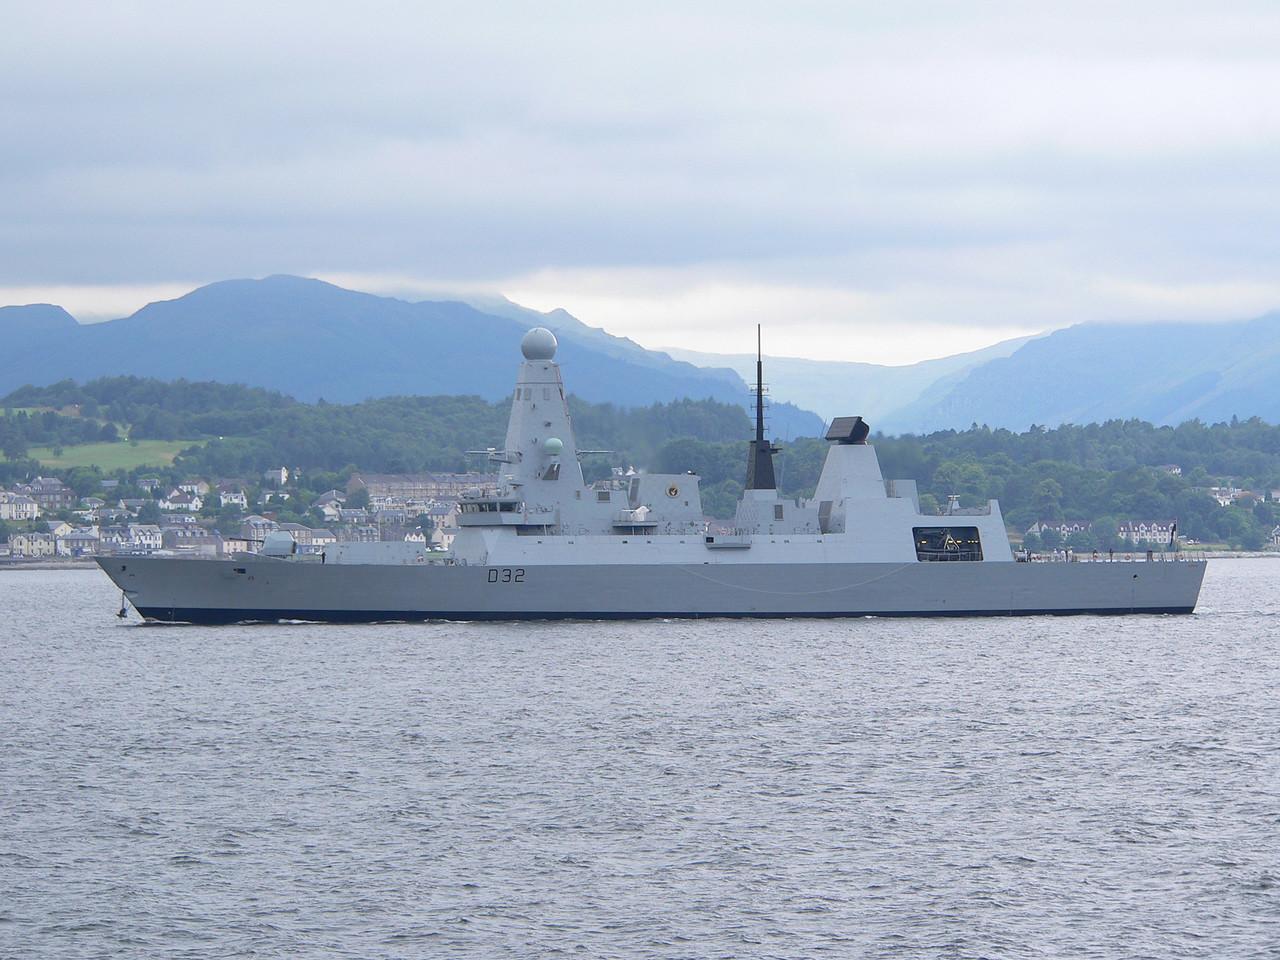 D-32 HMS DARING